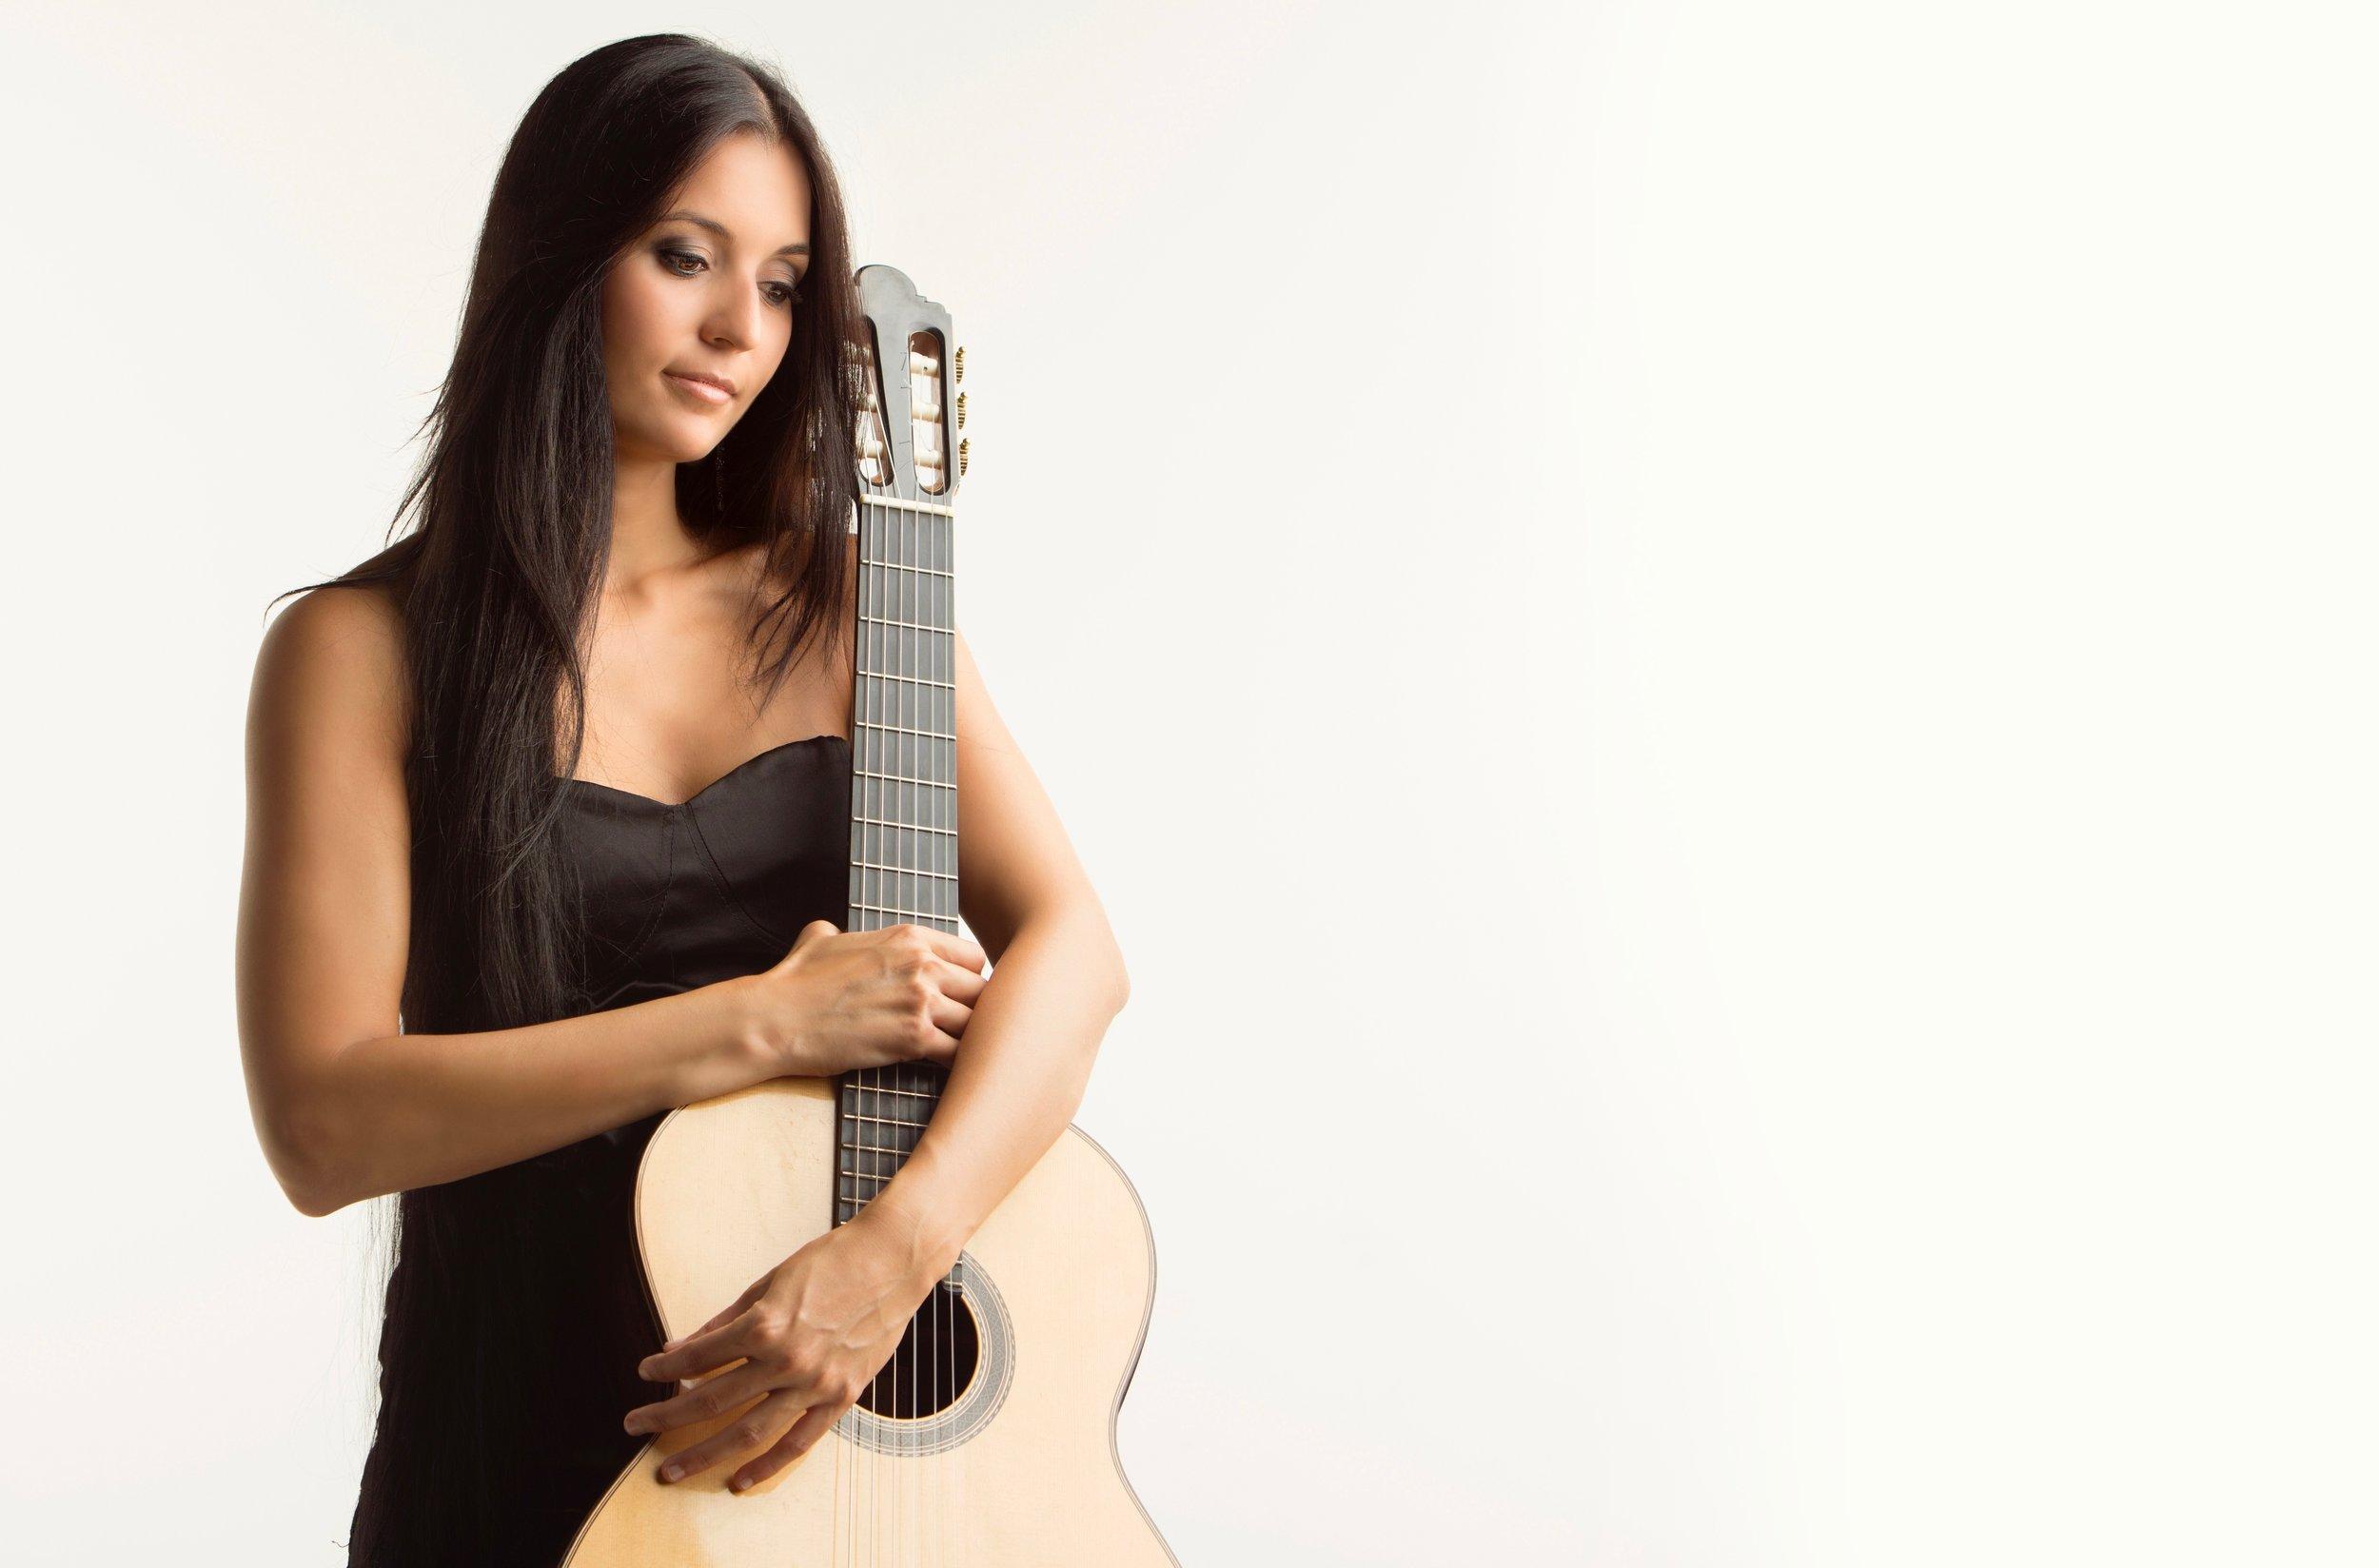 isabel martinez guitar 16.jpg